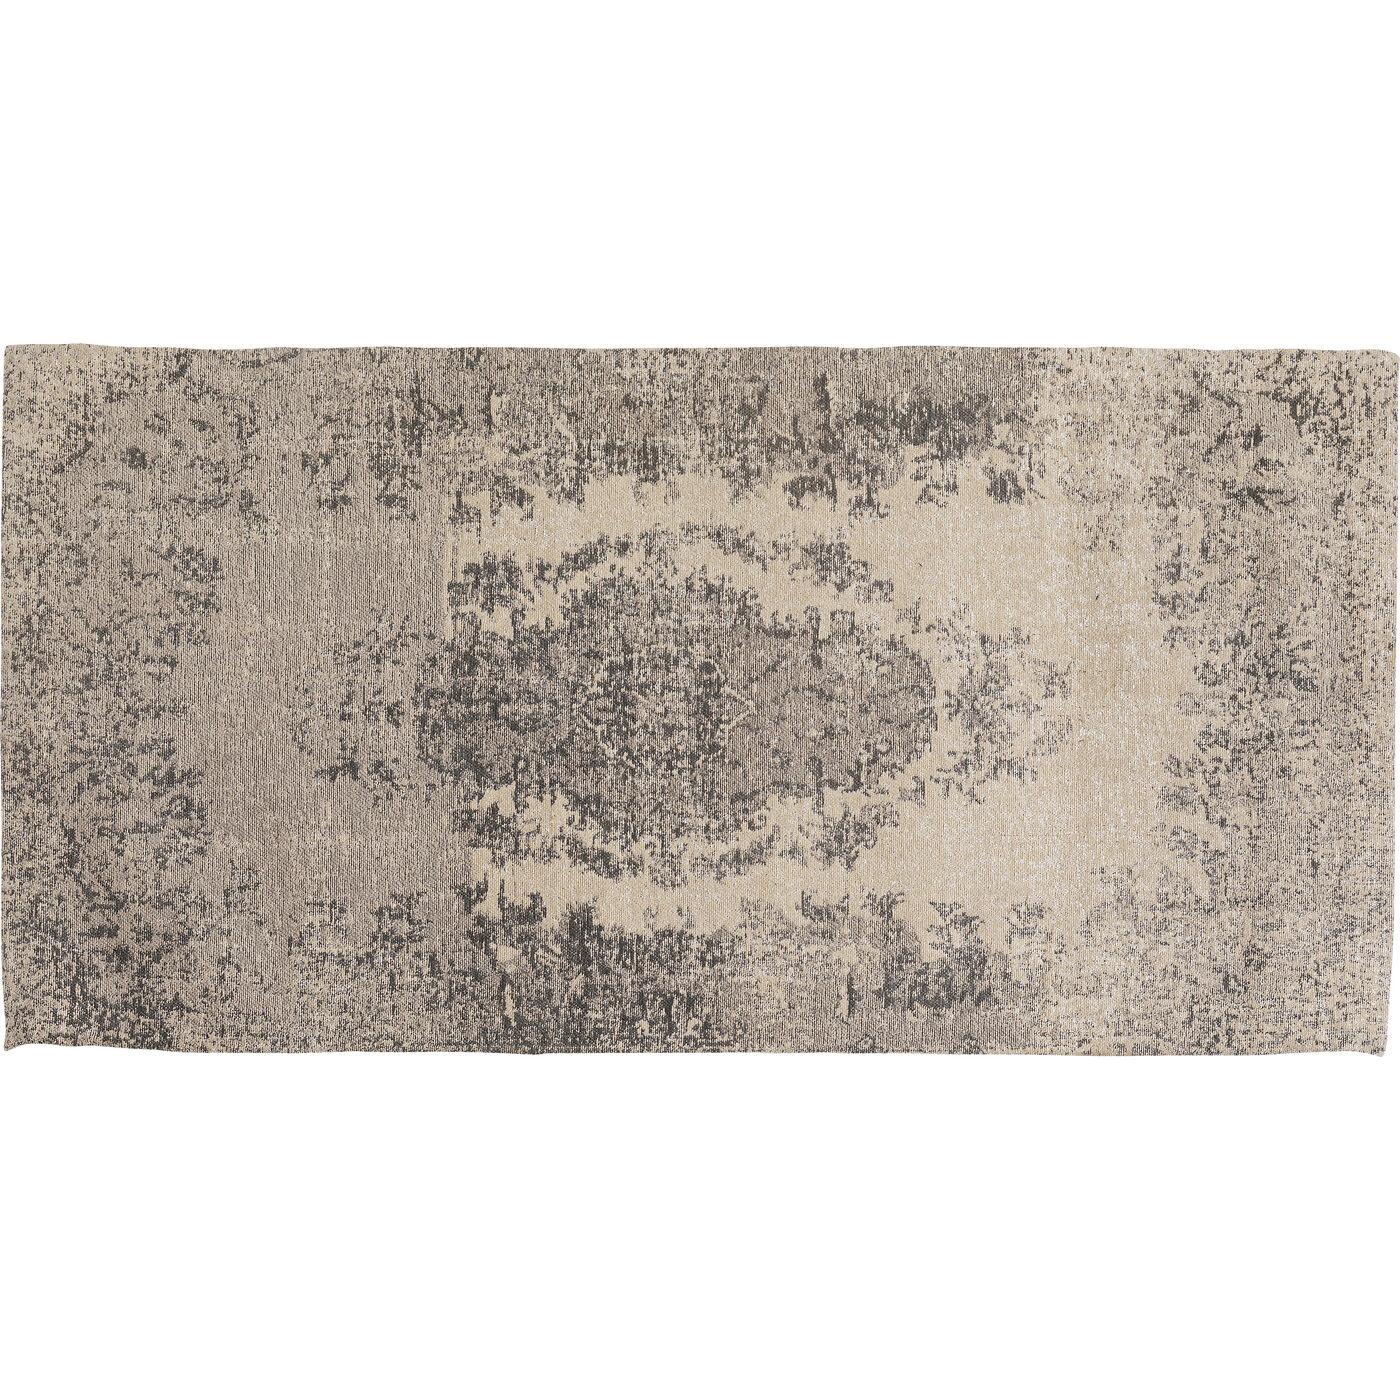 Teppich Vintage Grau 80x150cm